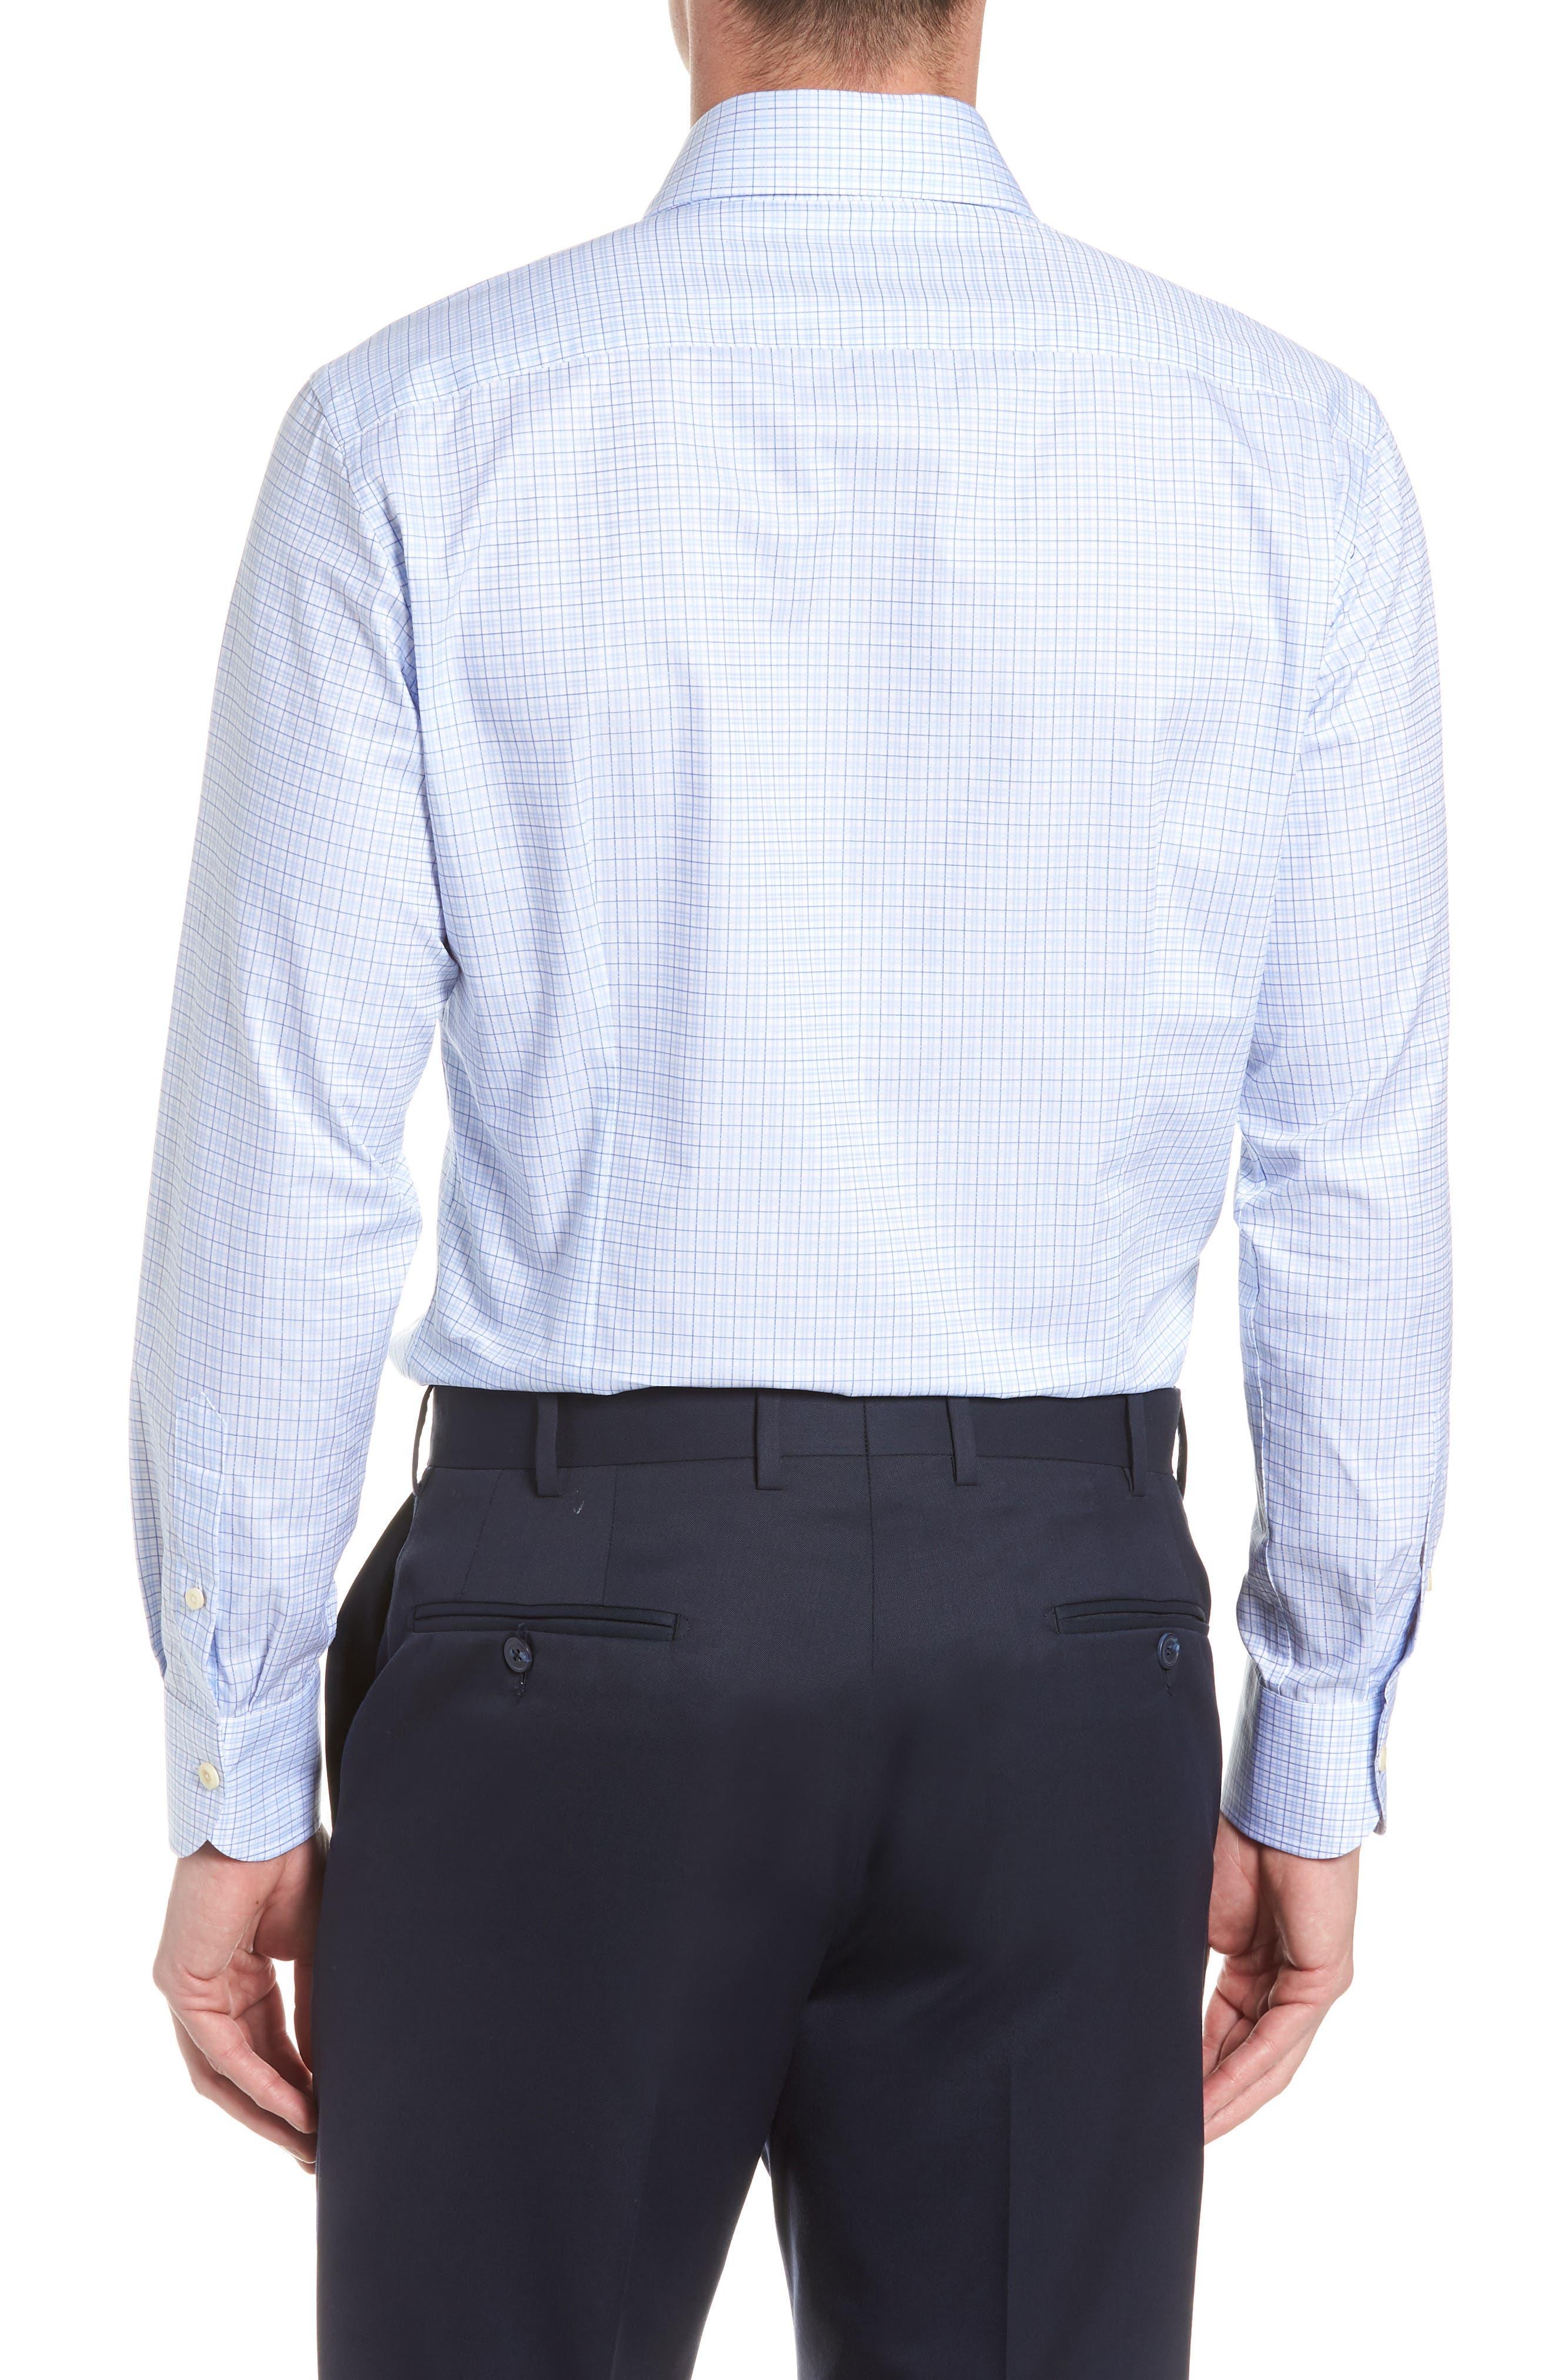 Moorland Trim Fit Check Dress Shirt,                             Alternate thumbnail 3, color,                             Blue